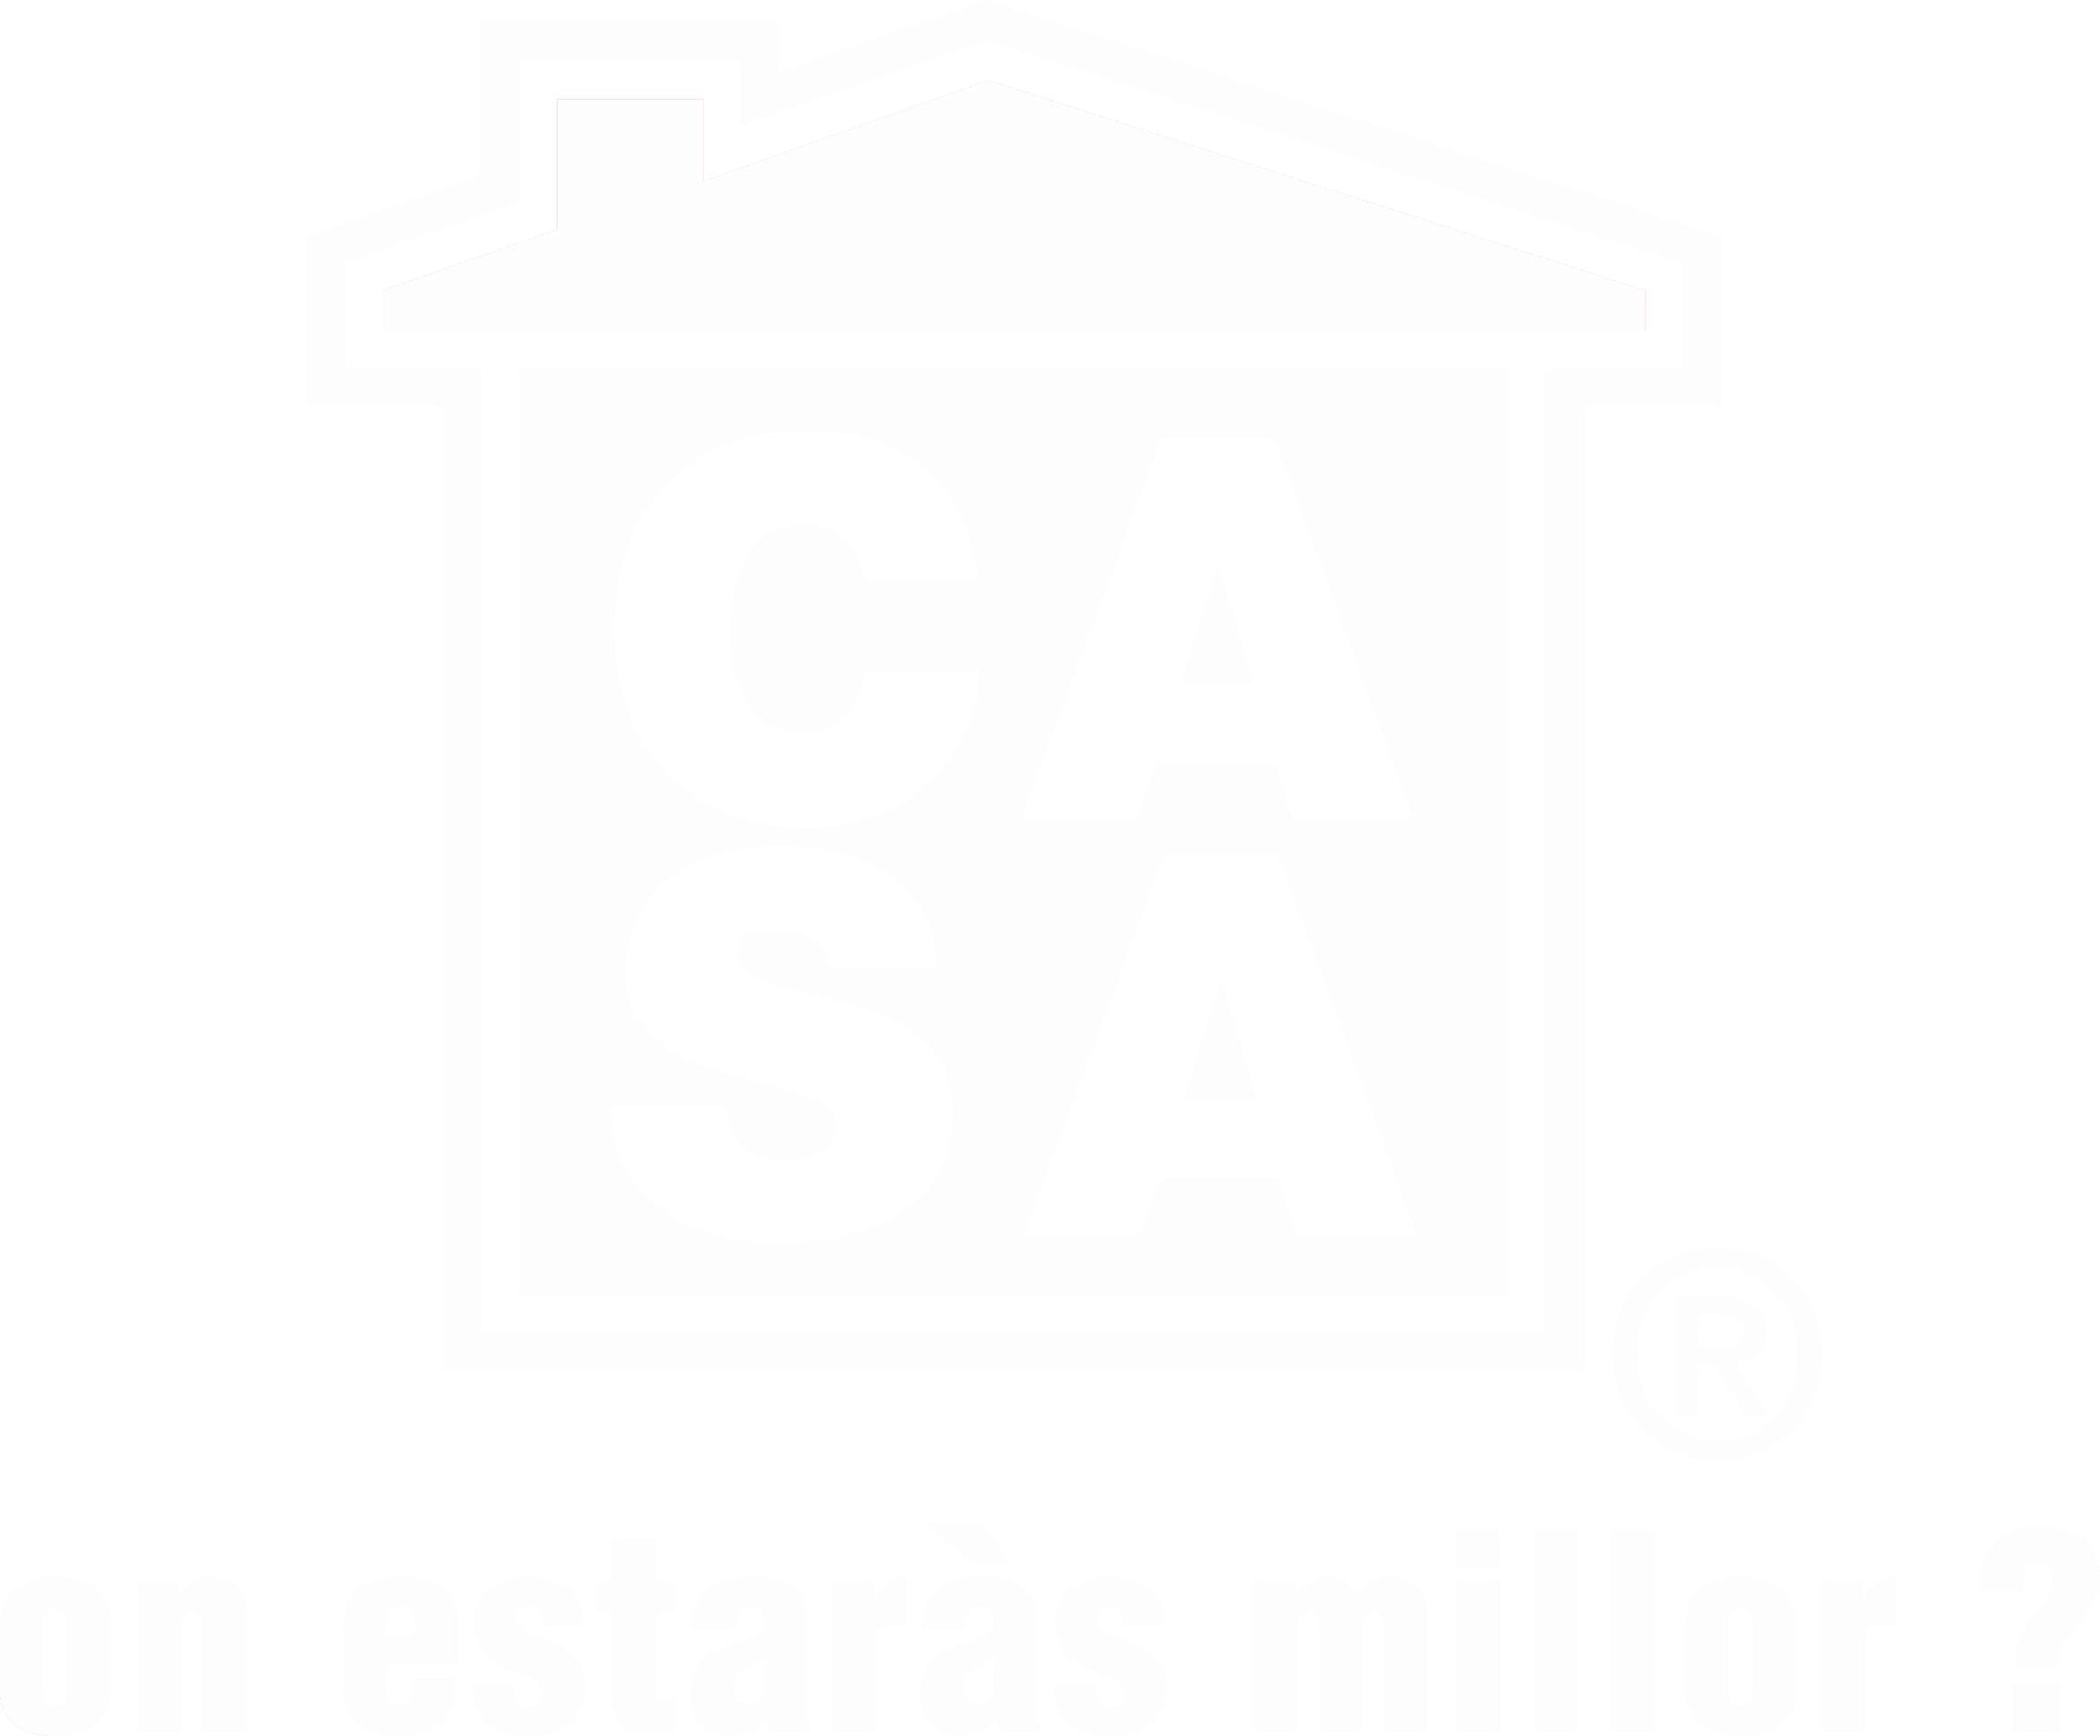 Pisos-obra-nueva-Barcelona-logo-CASA-blanco-transparente